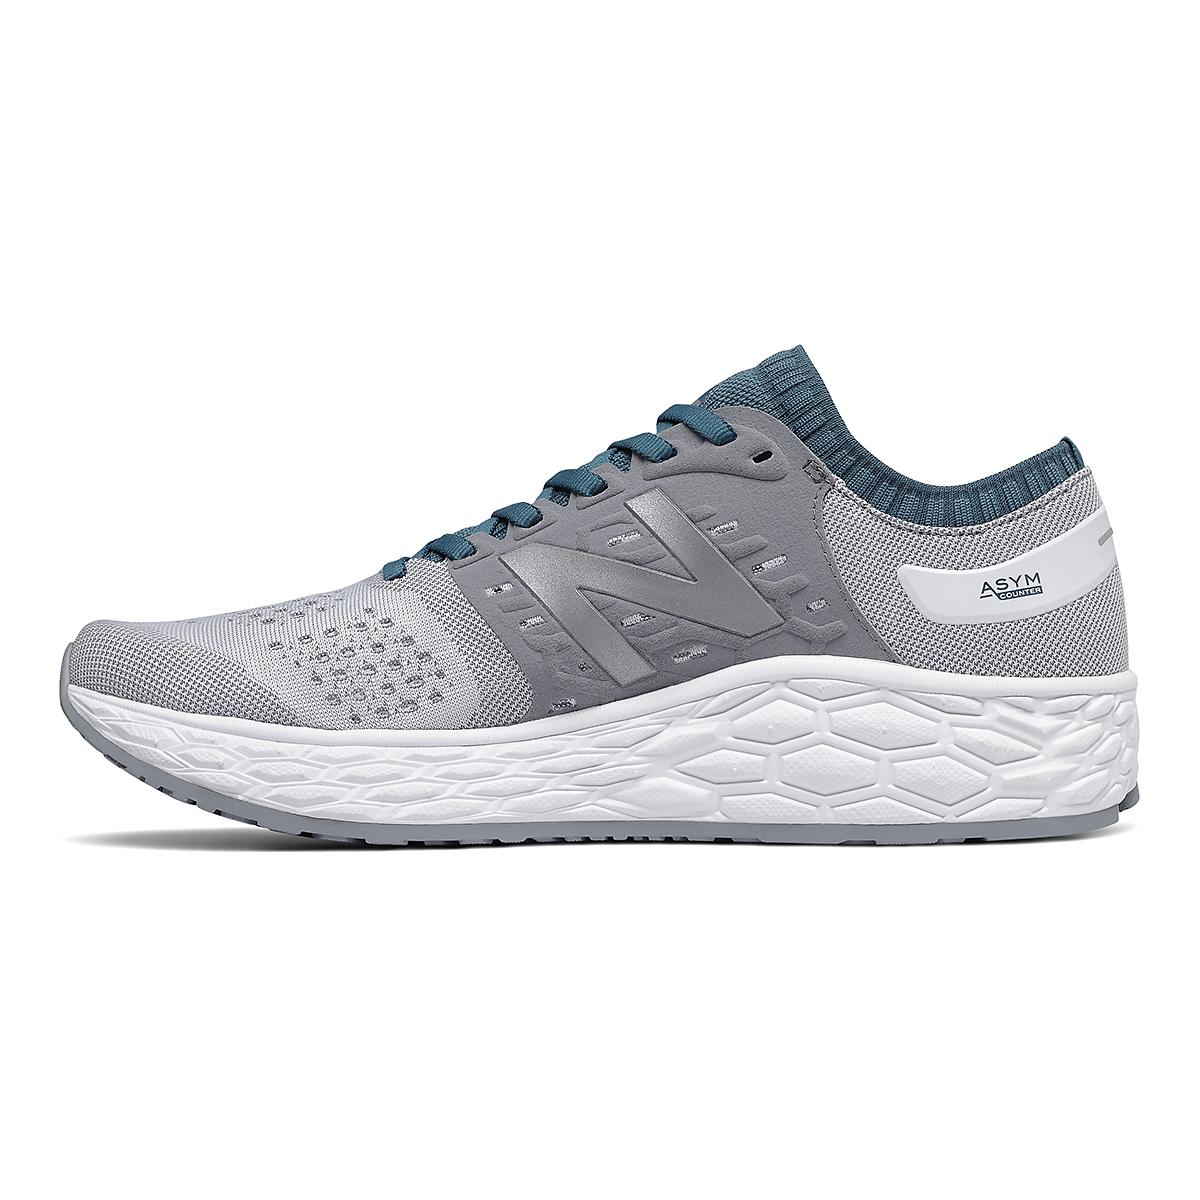 Men's New Balance Vongo V4 Running Shoe - Color: White - Size: 8 - Width: Regular, White, large, image 2